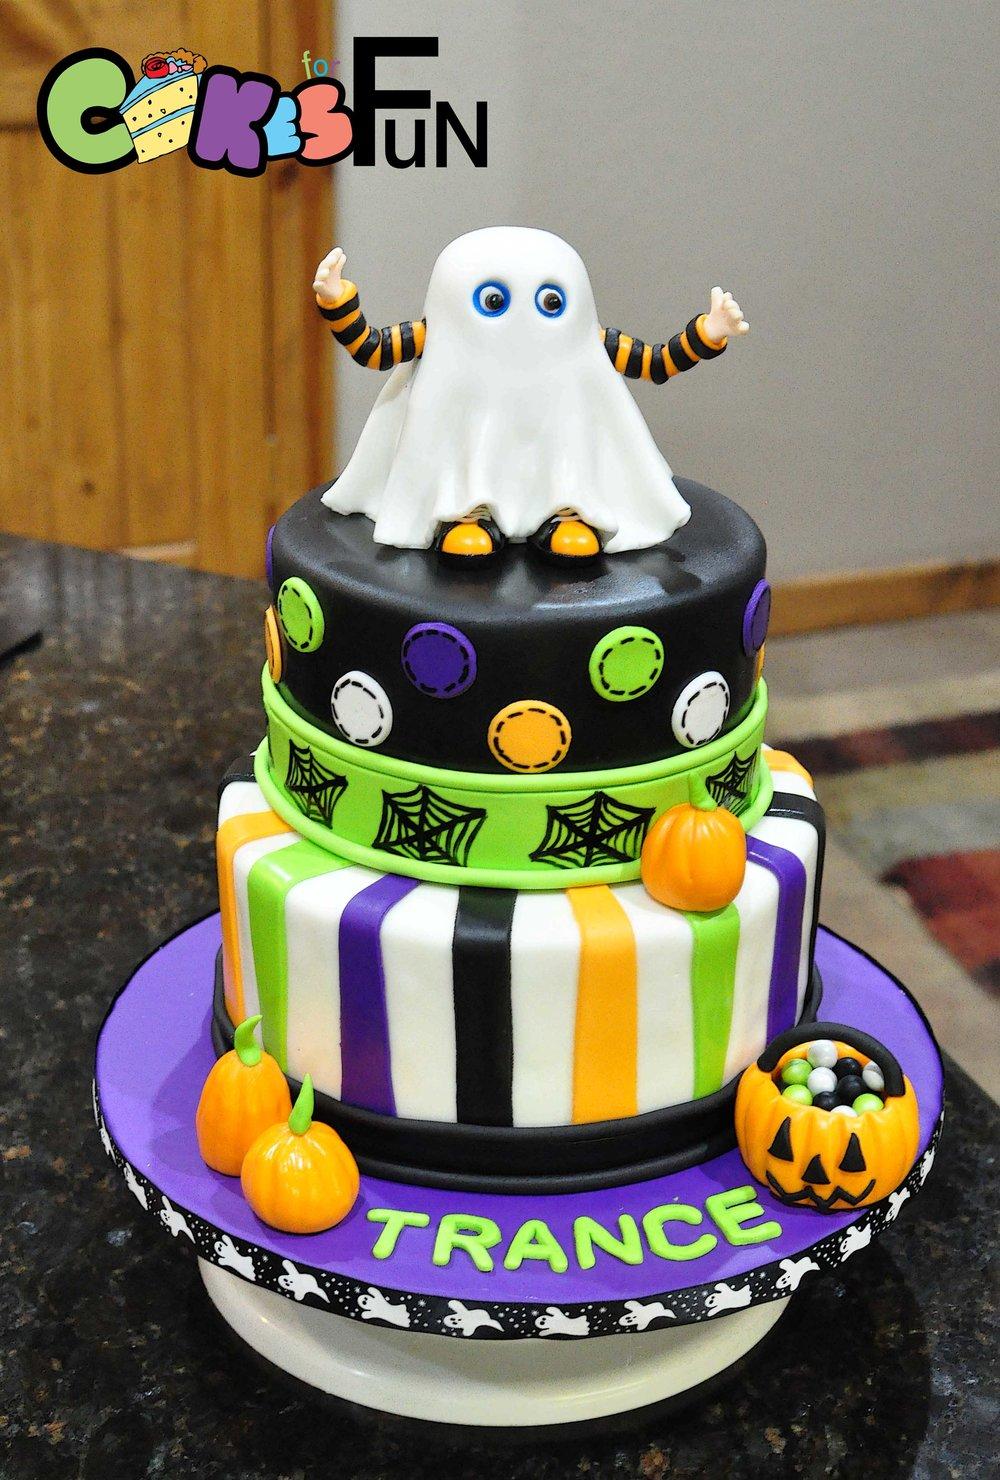 Ghost cake - Branton.jpg